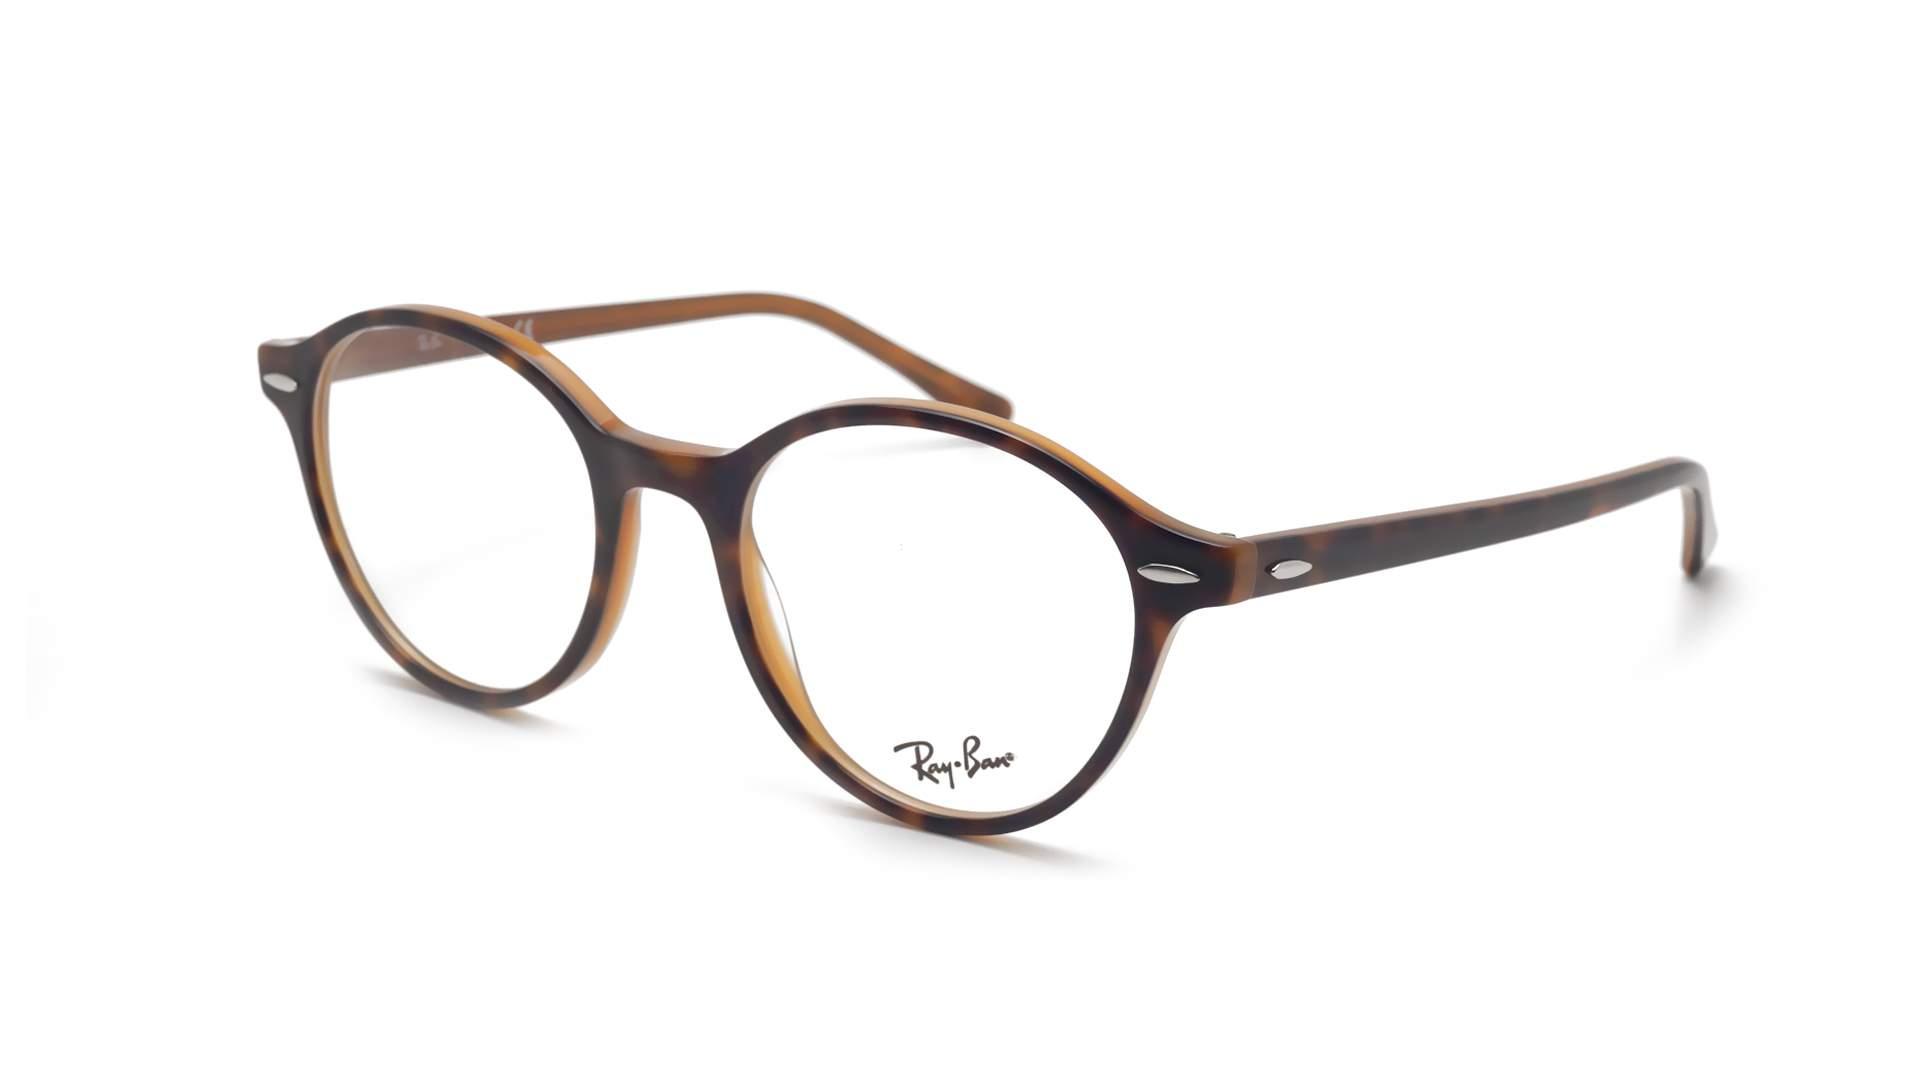 6830de49c3e Eyeglasses Ray-Ban RX7118 RB7118 5713 50-19 Tortoise Medium